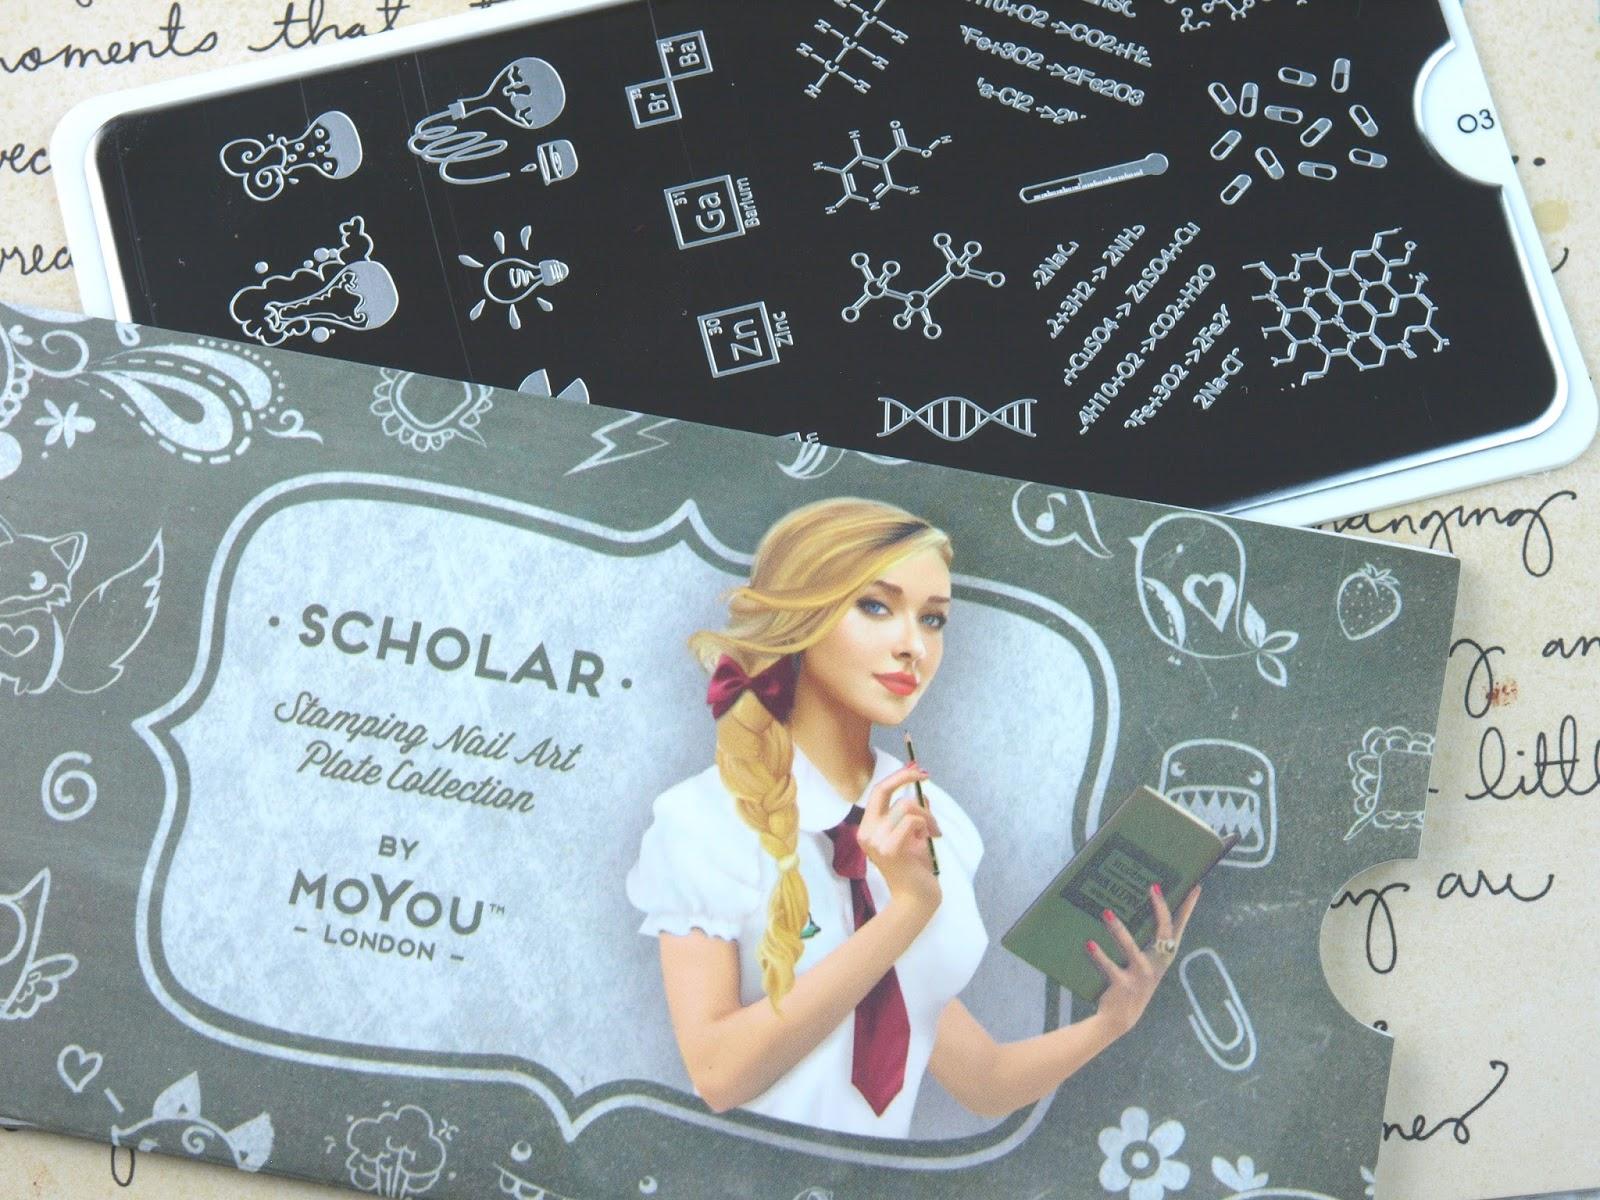 moyou london scholar plates